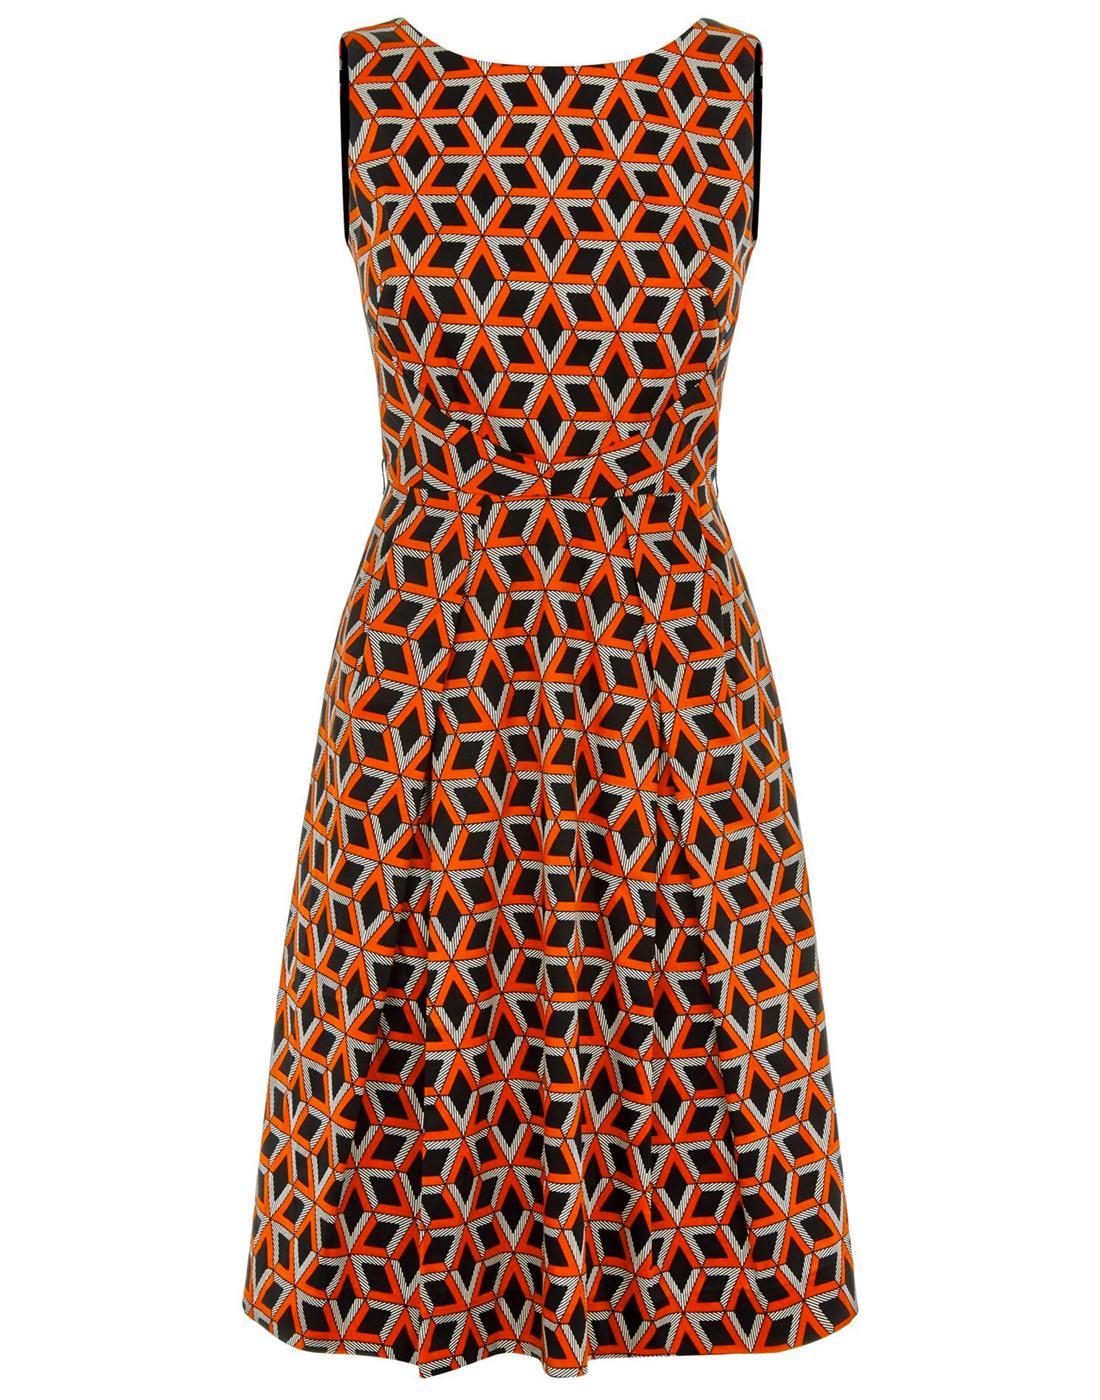 Doris TRAFFIC PEOPLE Retro 60s Pattern Party Dress